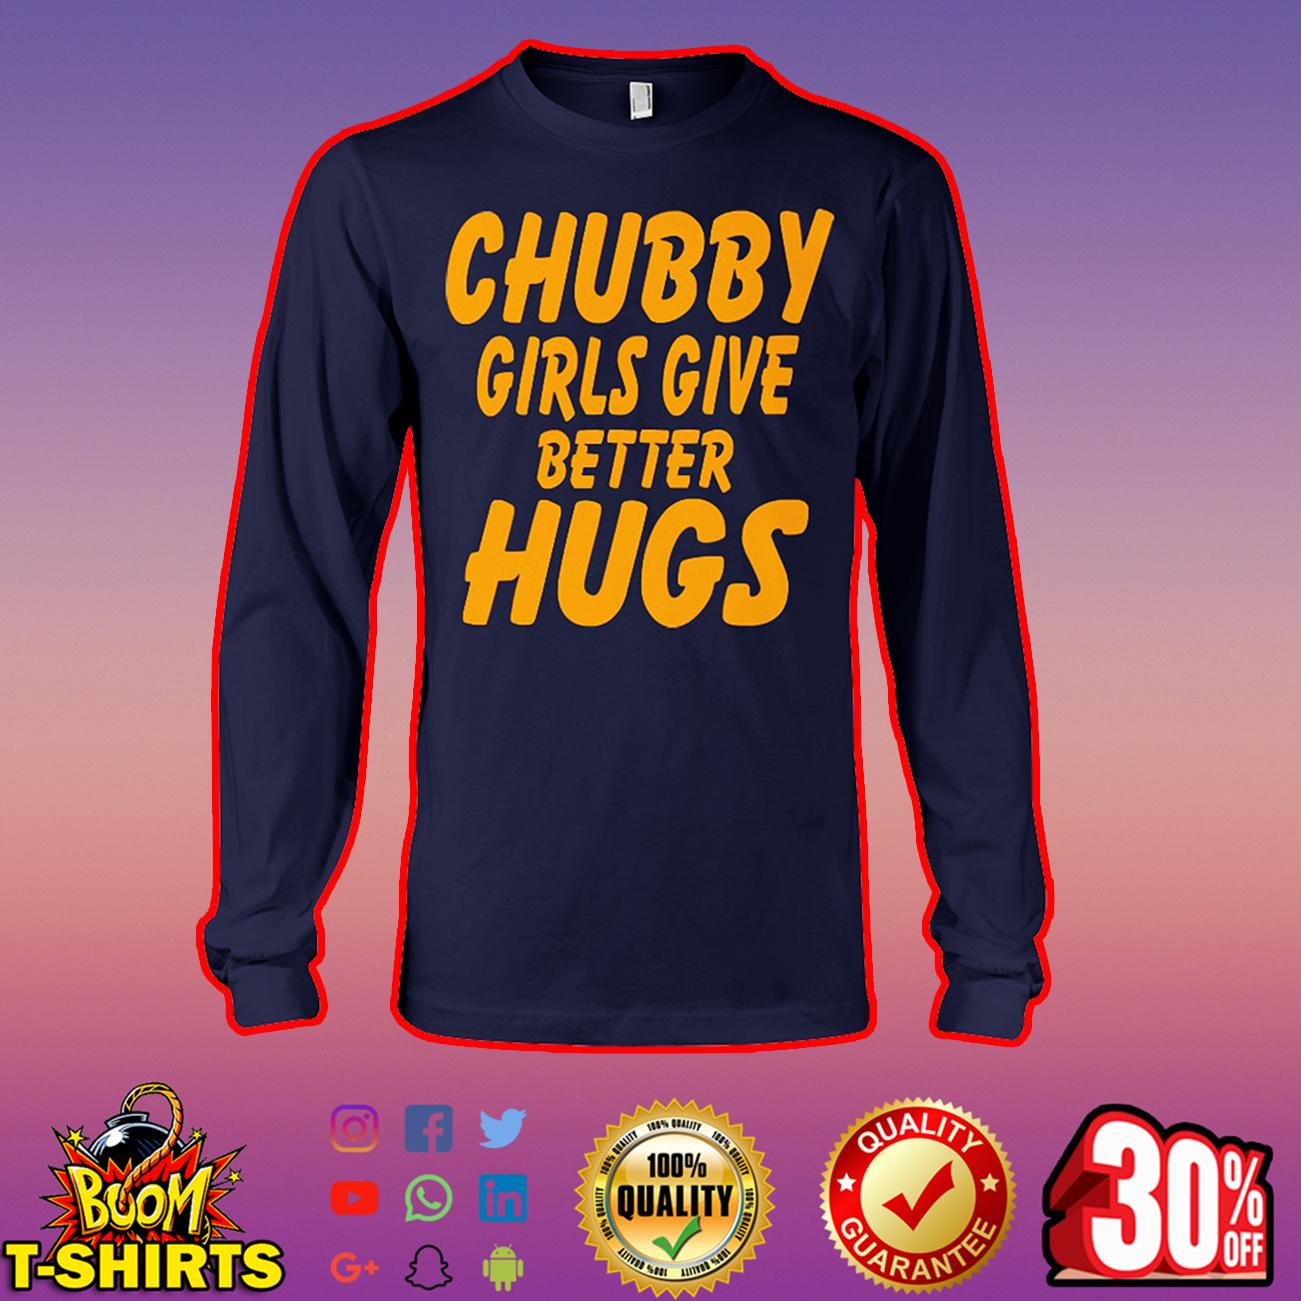 Chubby girls give better hugs long sleeve tee